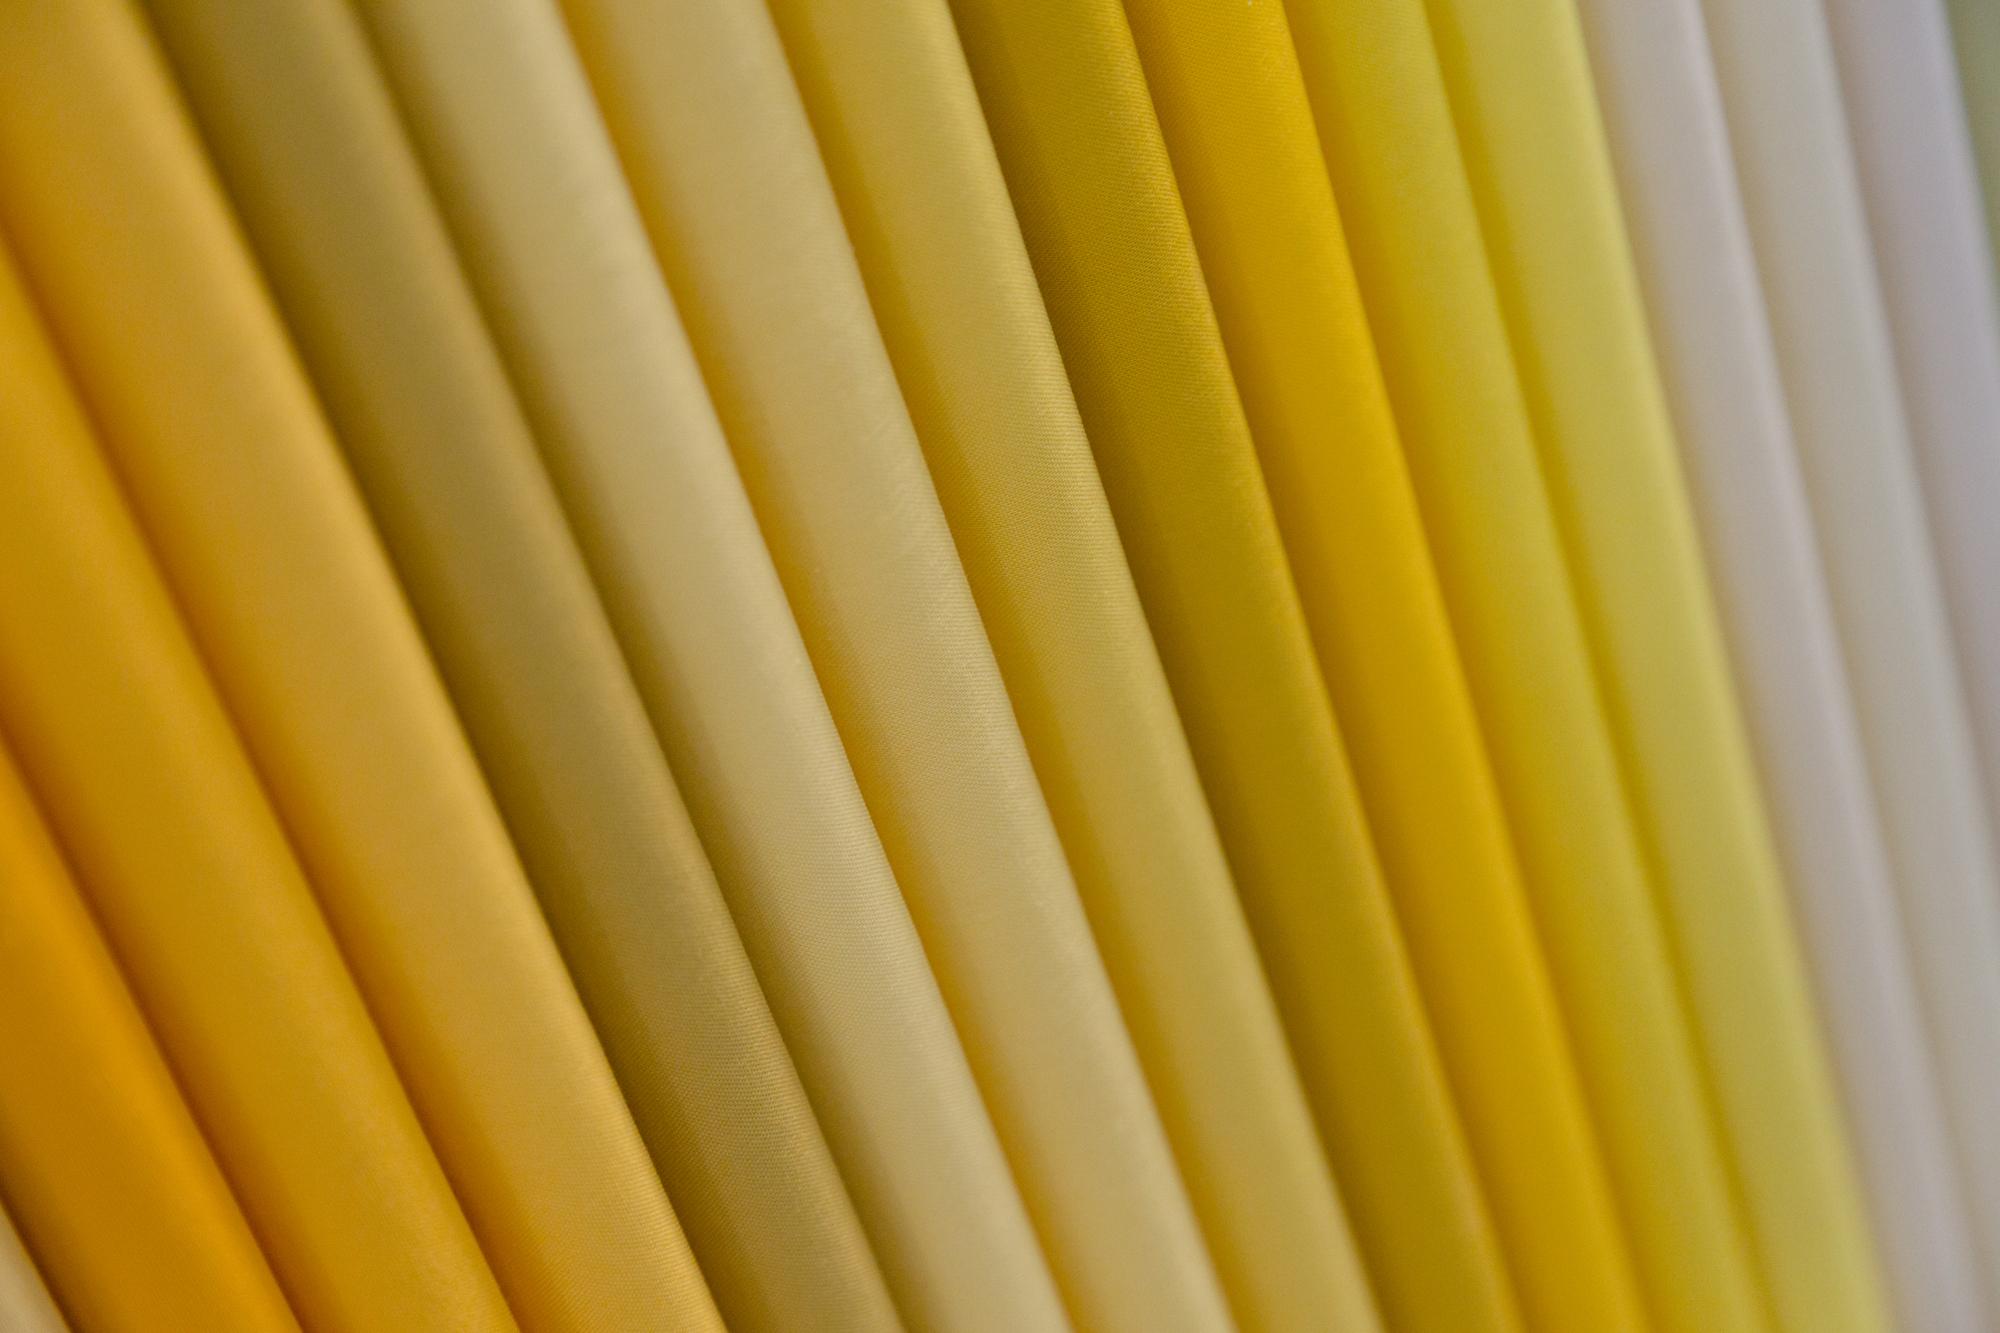 RK_QMfall17_Kona colors wall_05.jpg